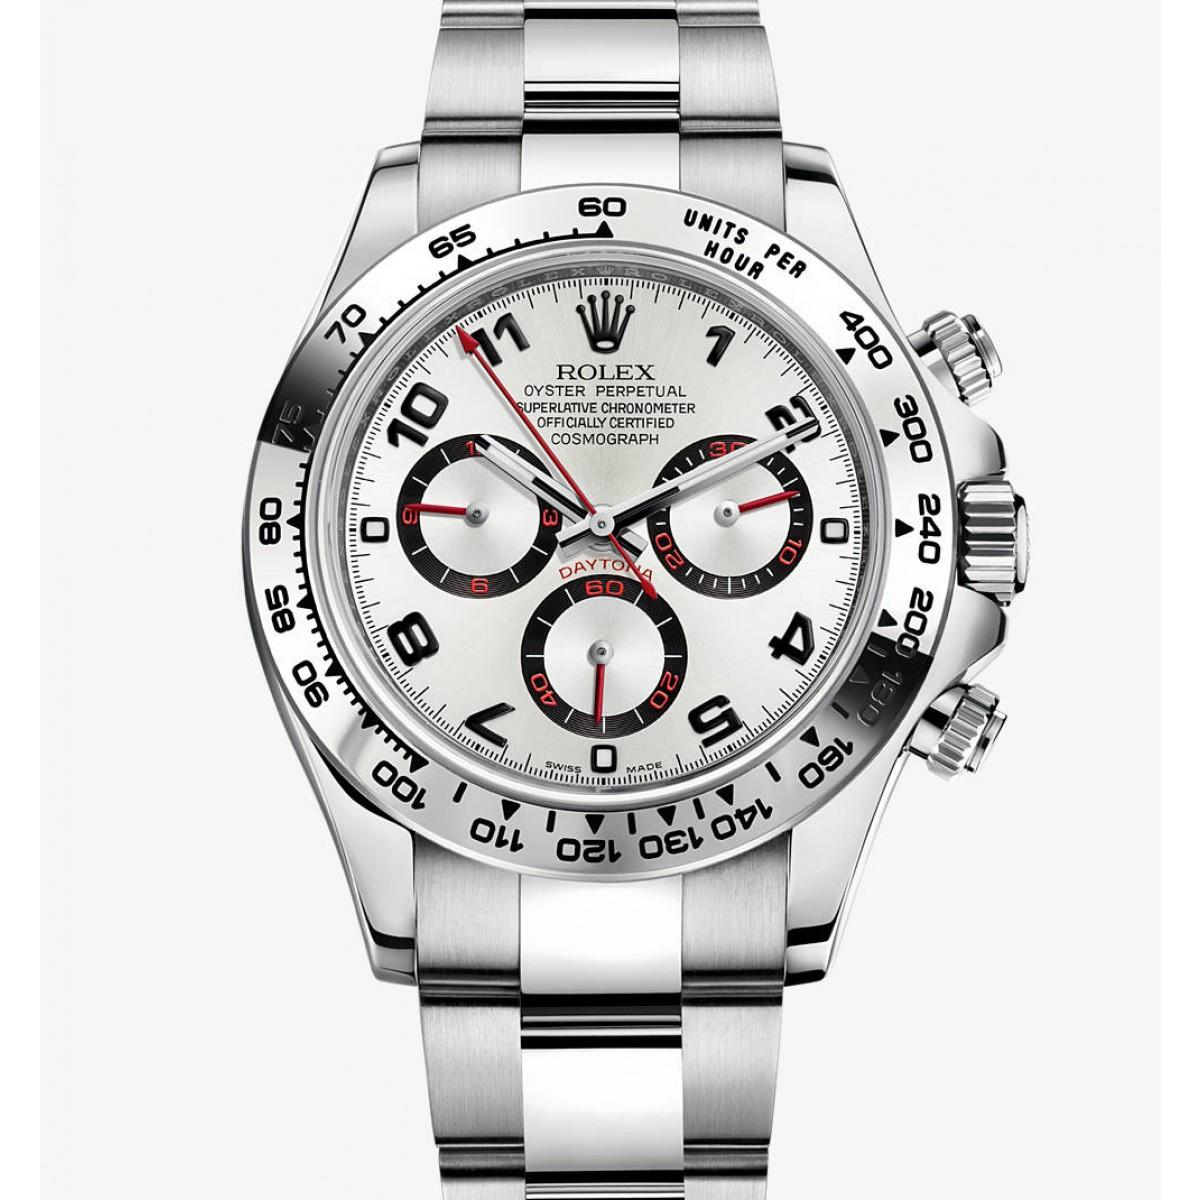 Relógio Réplica Rolex Daytona Oyster Perpetual 59c64883fe9